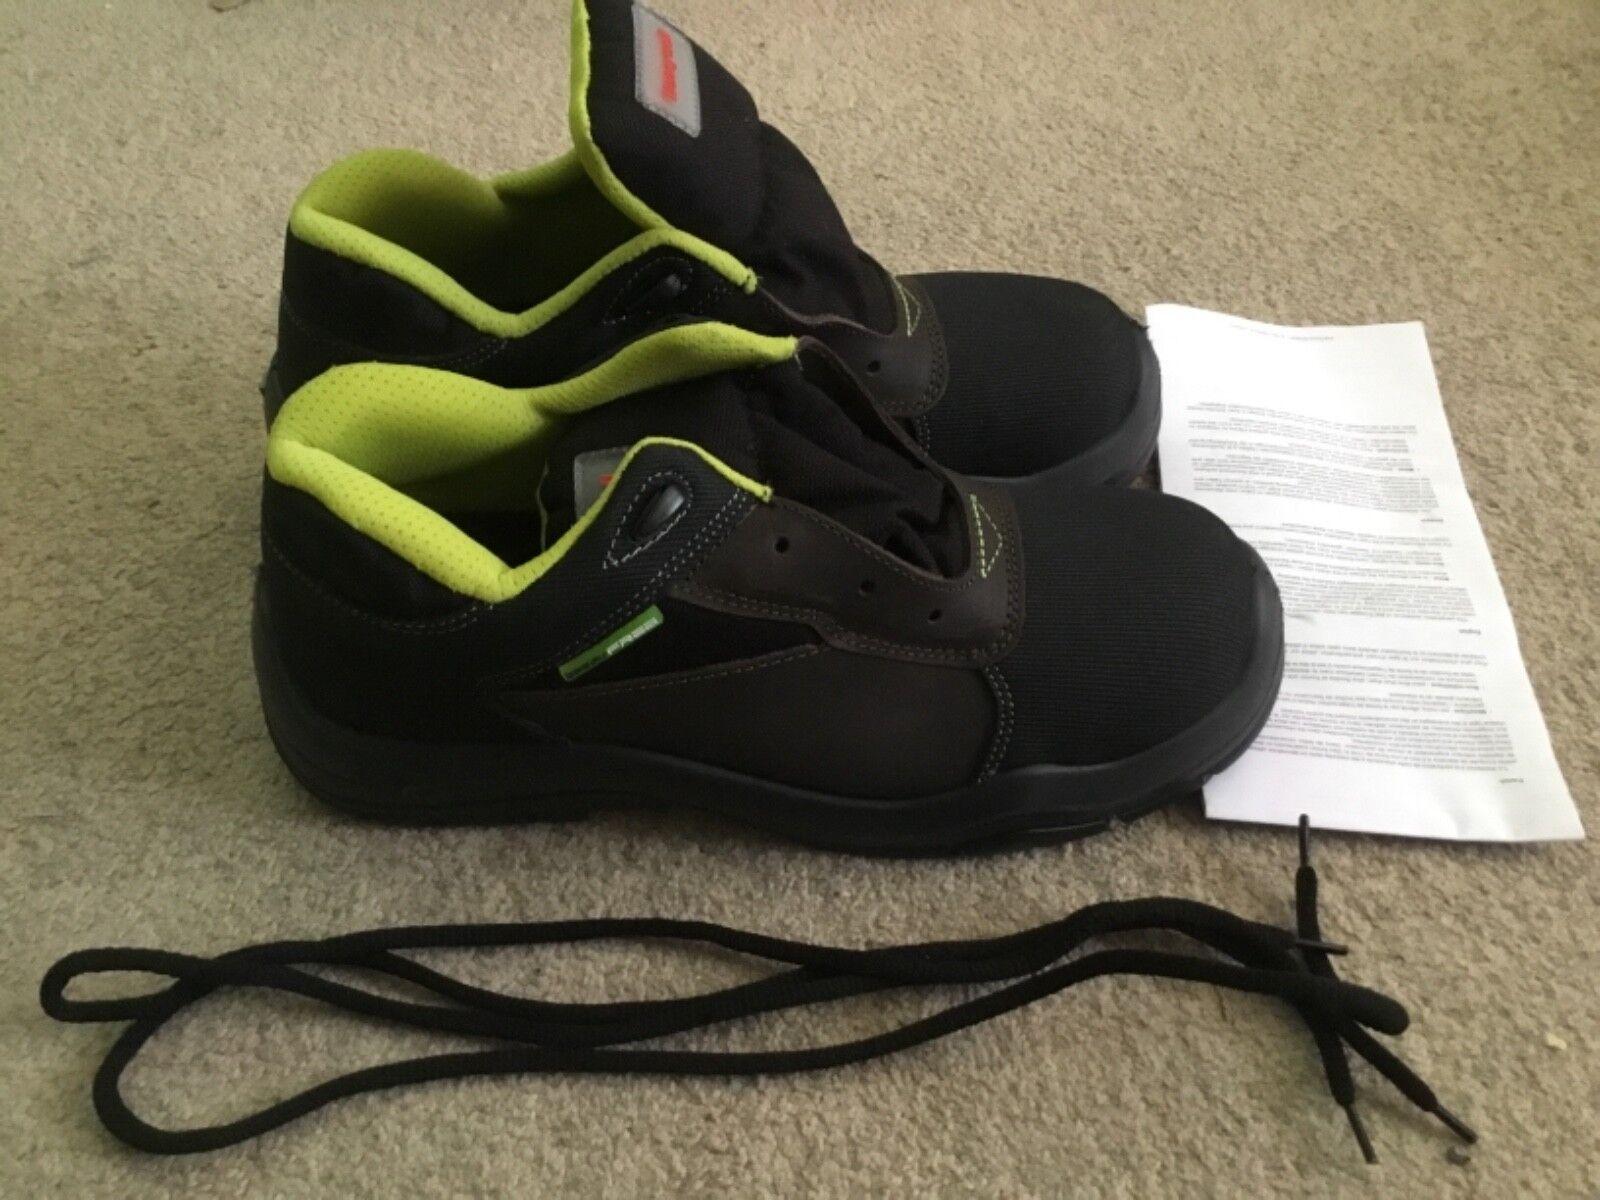 Honeywell 6246158-45/7 Footwear, Bacou Creek AMG Safety Footwear, 6246158-45/7 S3 CI SR UK10.5 / EU 45 050084